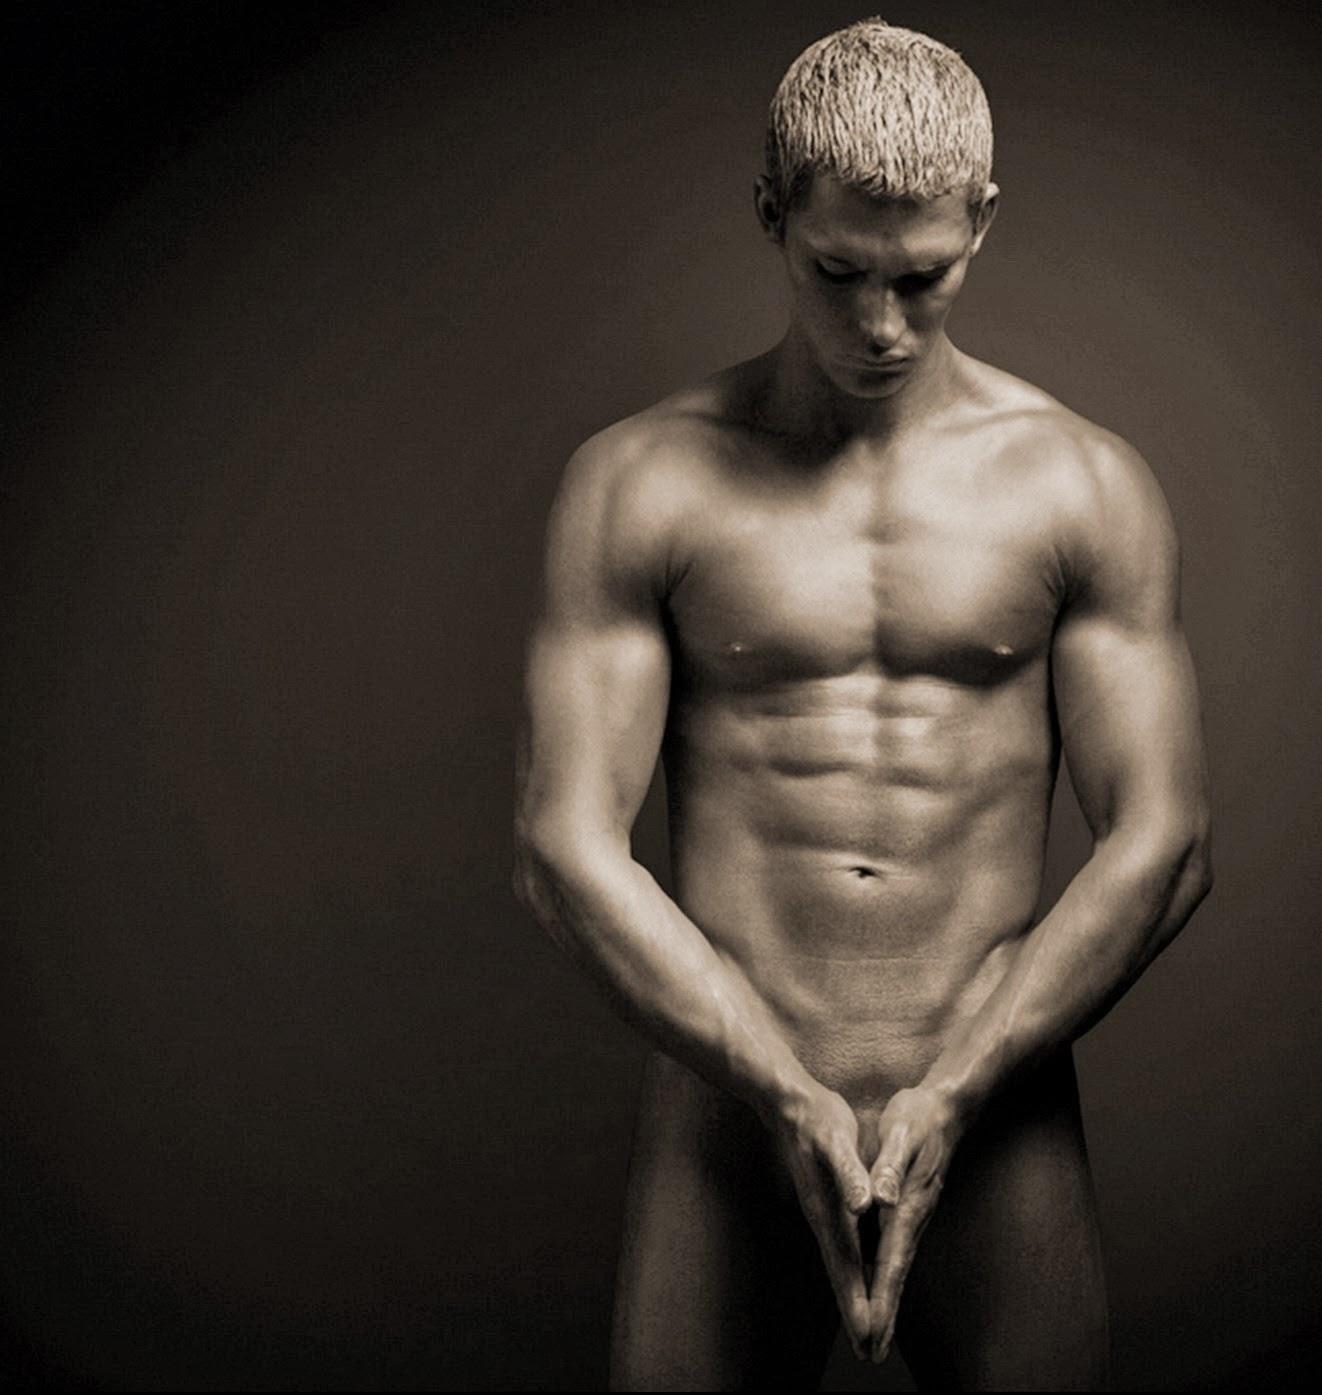 El erotismo masculino a travs de 5 fotgrafos - Cultura